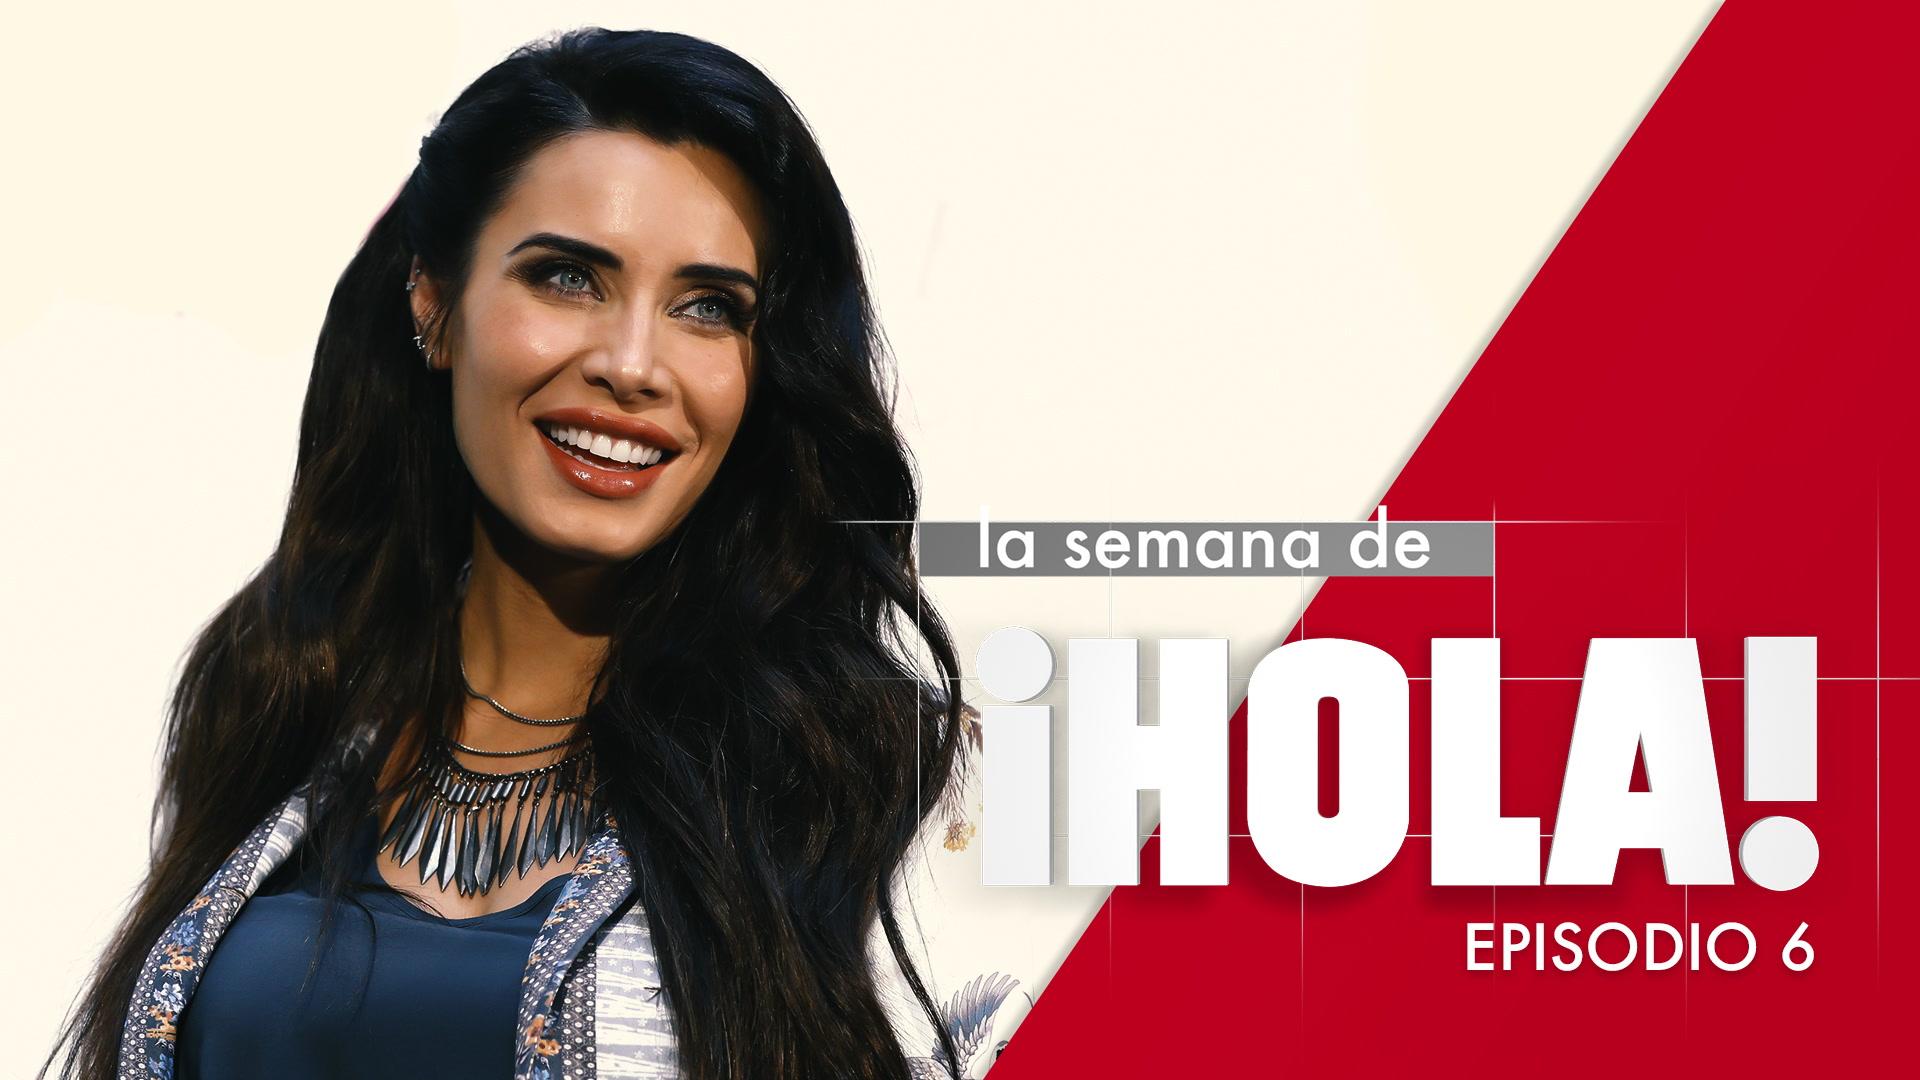 La semana de ¡HOLA! - Episodio 6